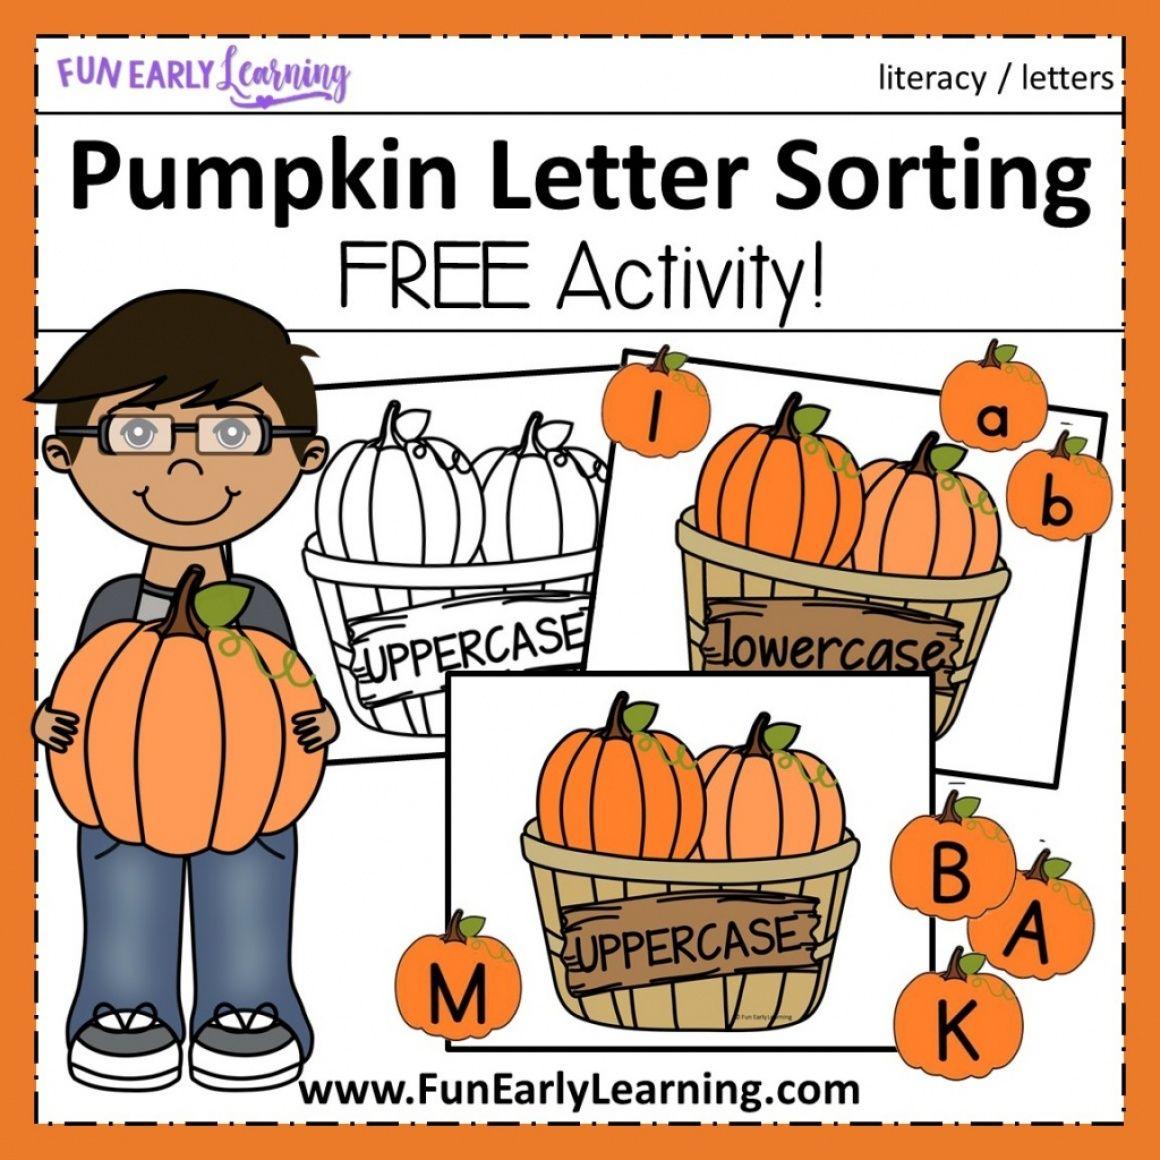 Pumpkin Letter Sorting Activity